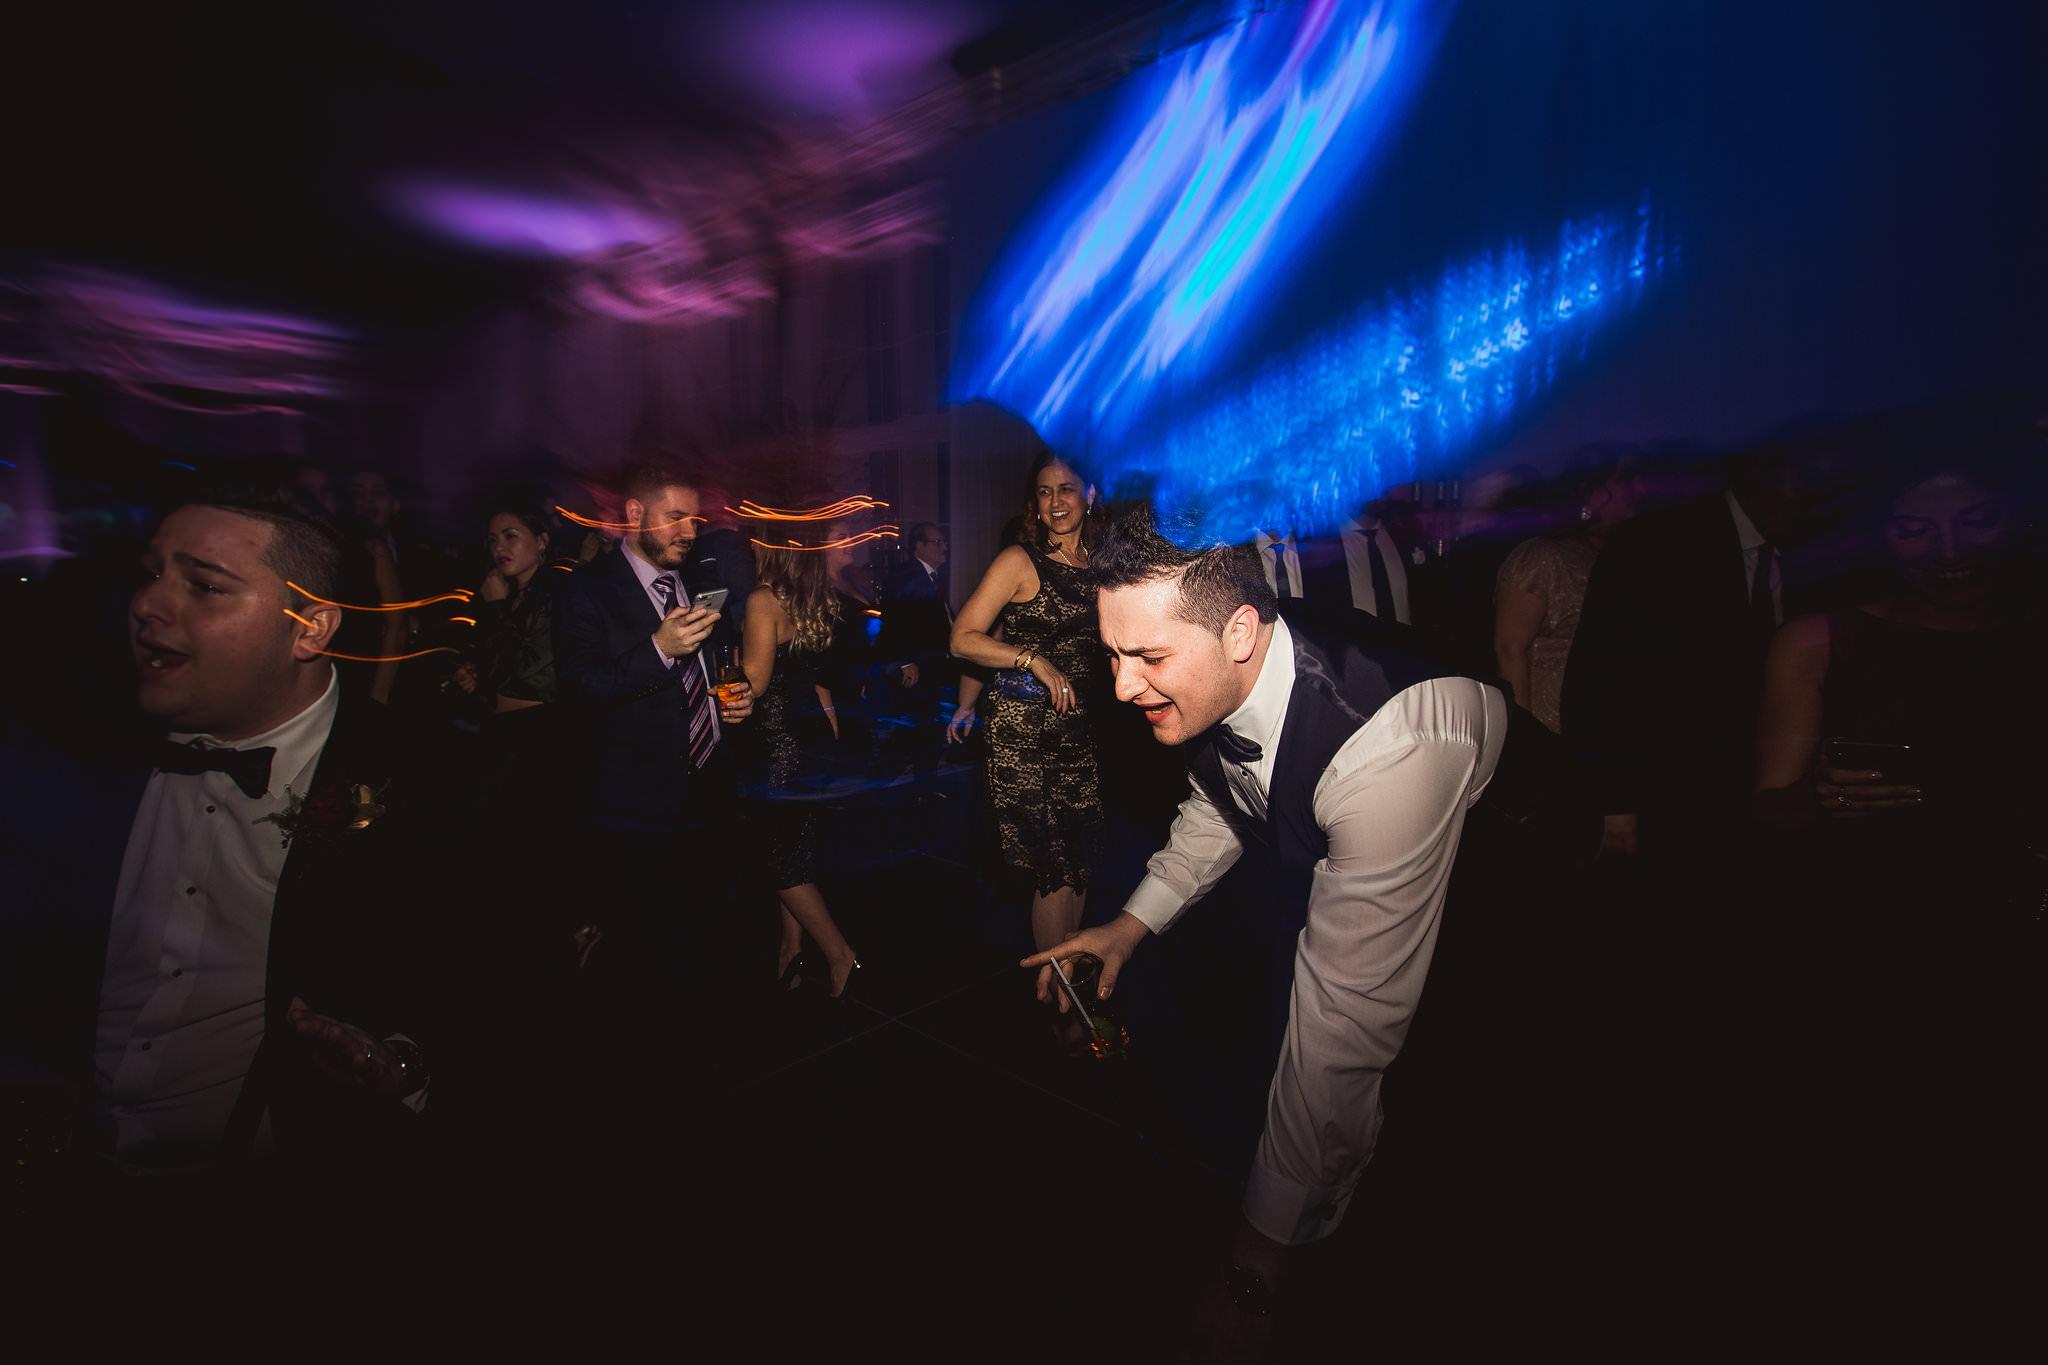 dancing photos king edward wedding